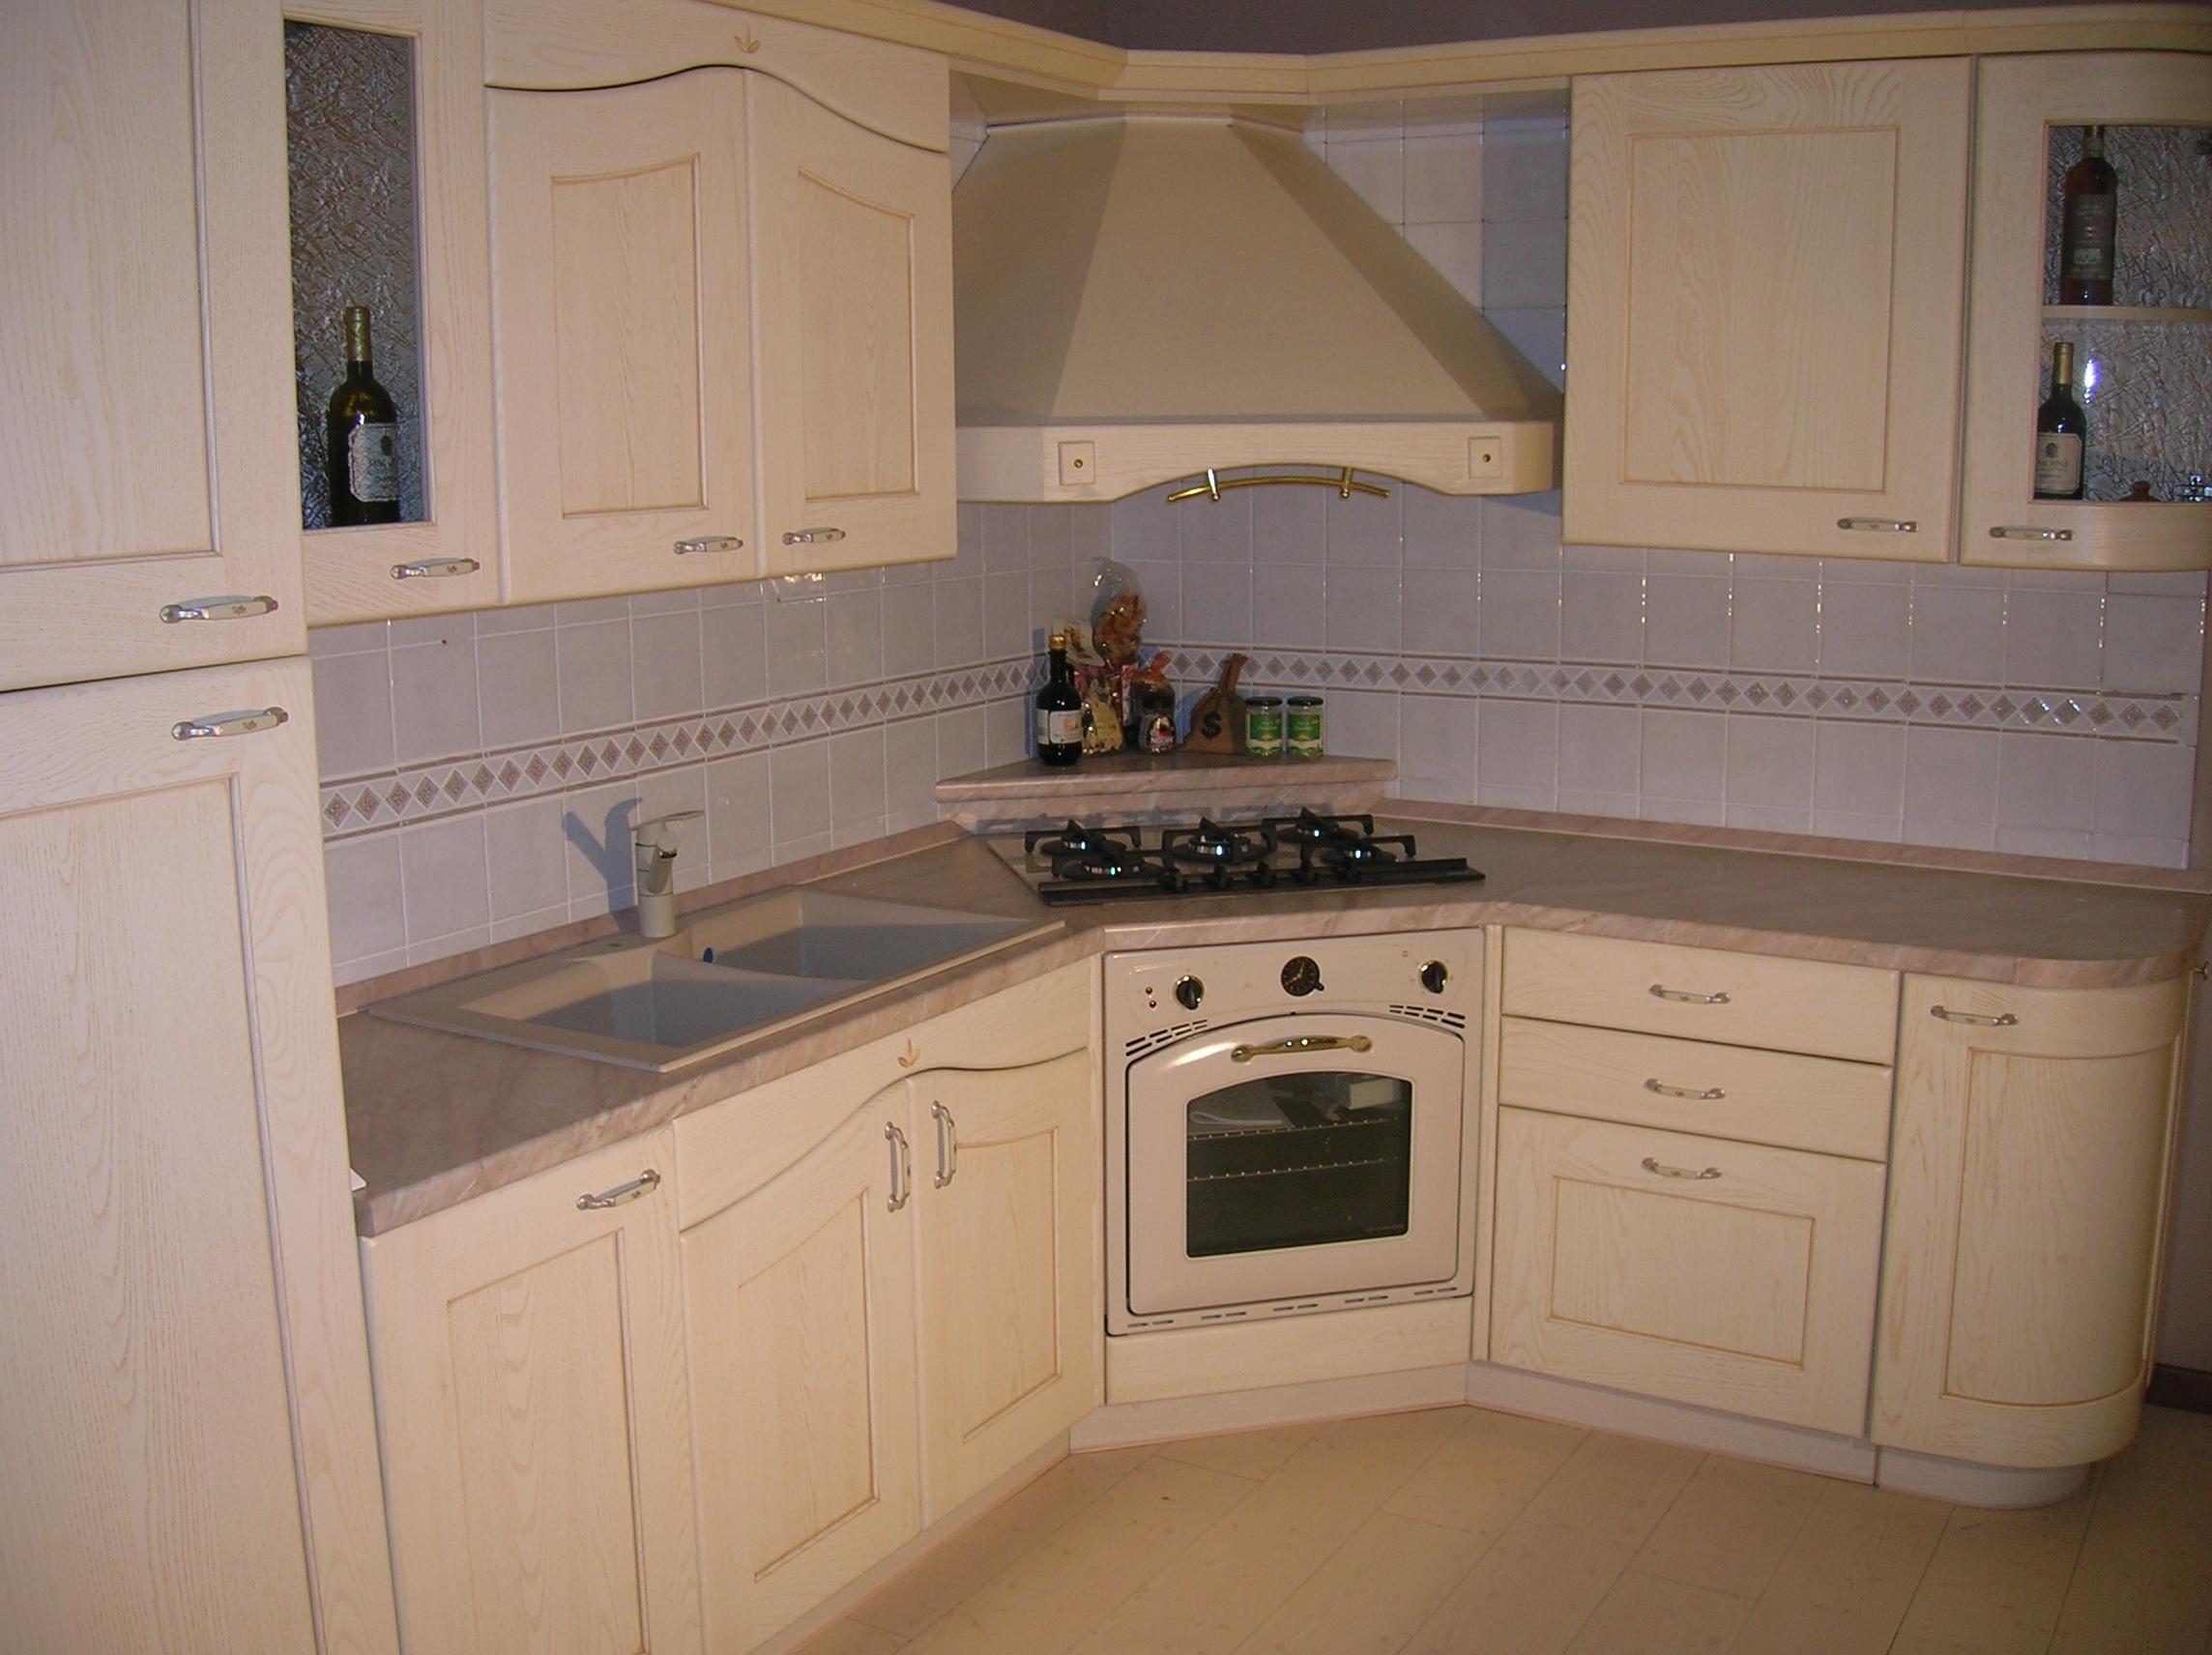 Costo cucina in muratura cucine moderne cucine moderne economiche prezzi cucina salvaspazio - Costo cucina muratura ...